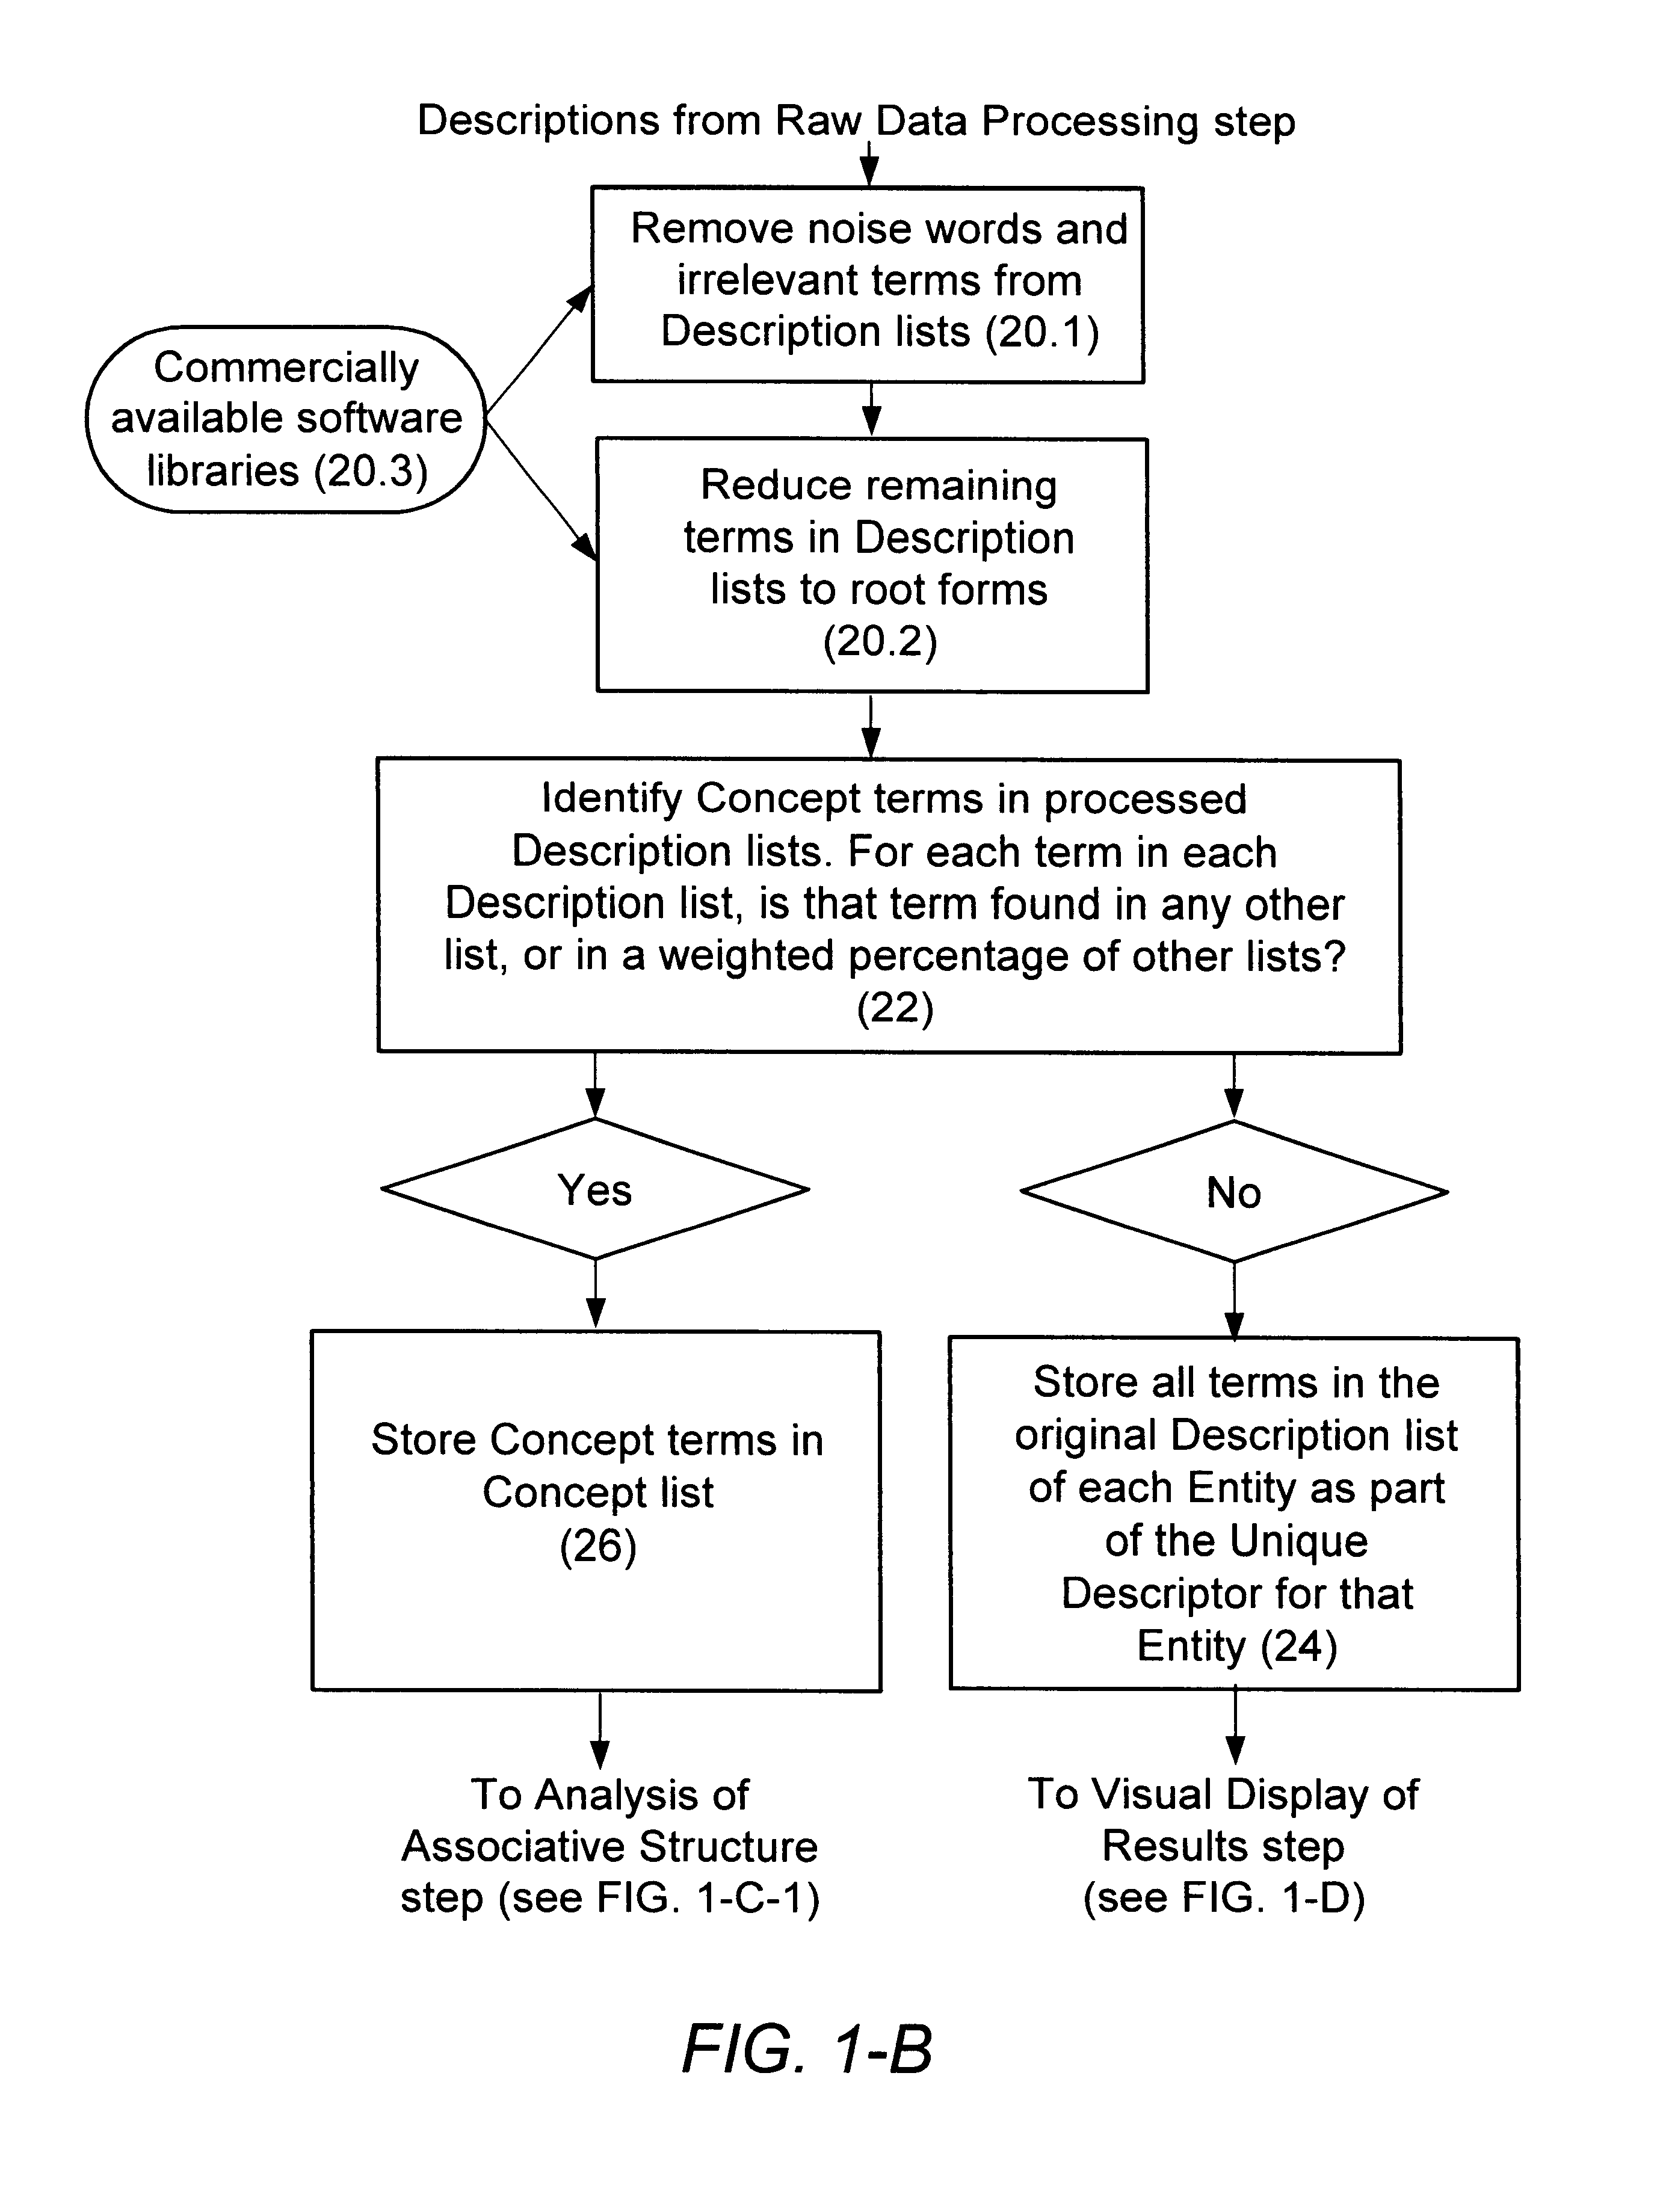 Patent US 6,629,097 B1